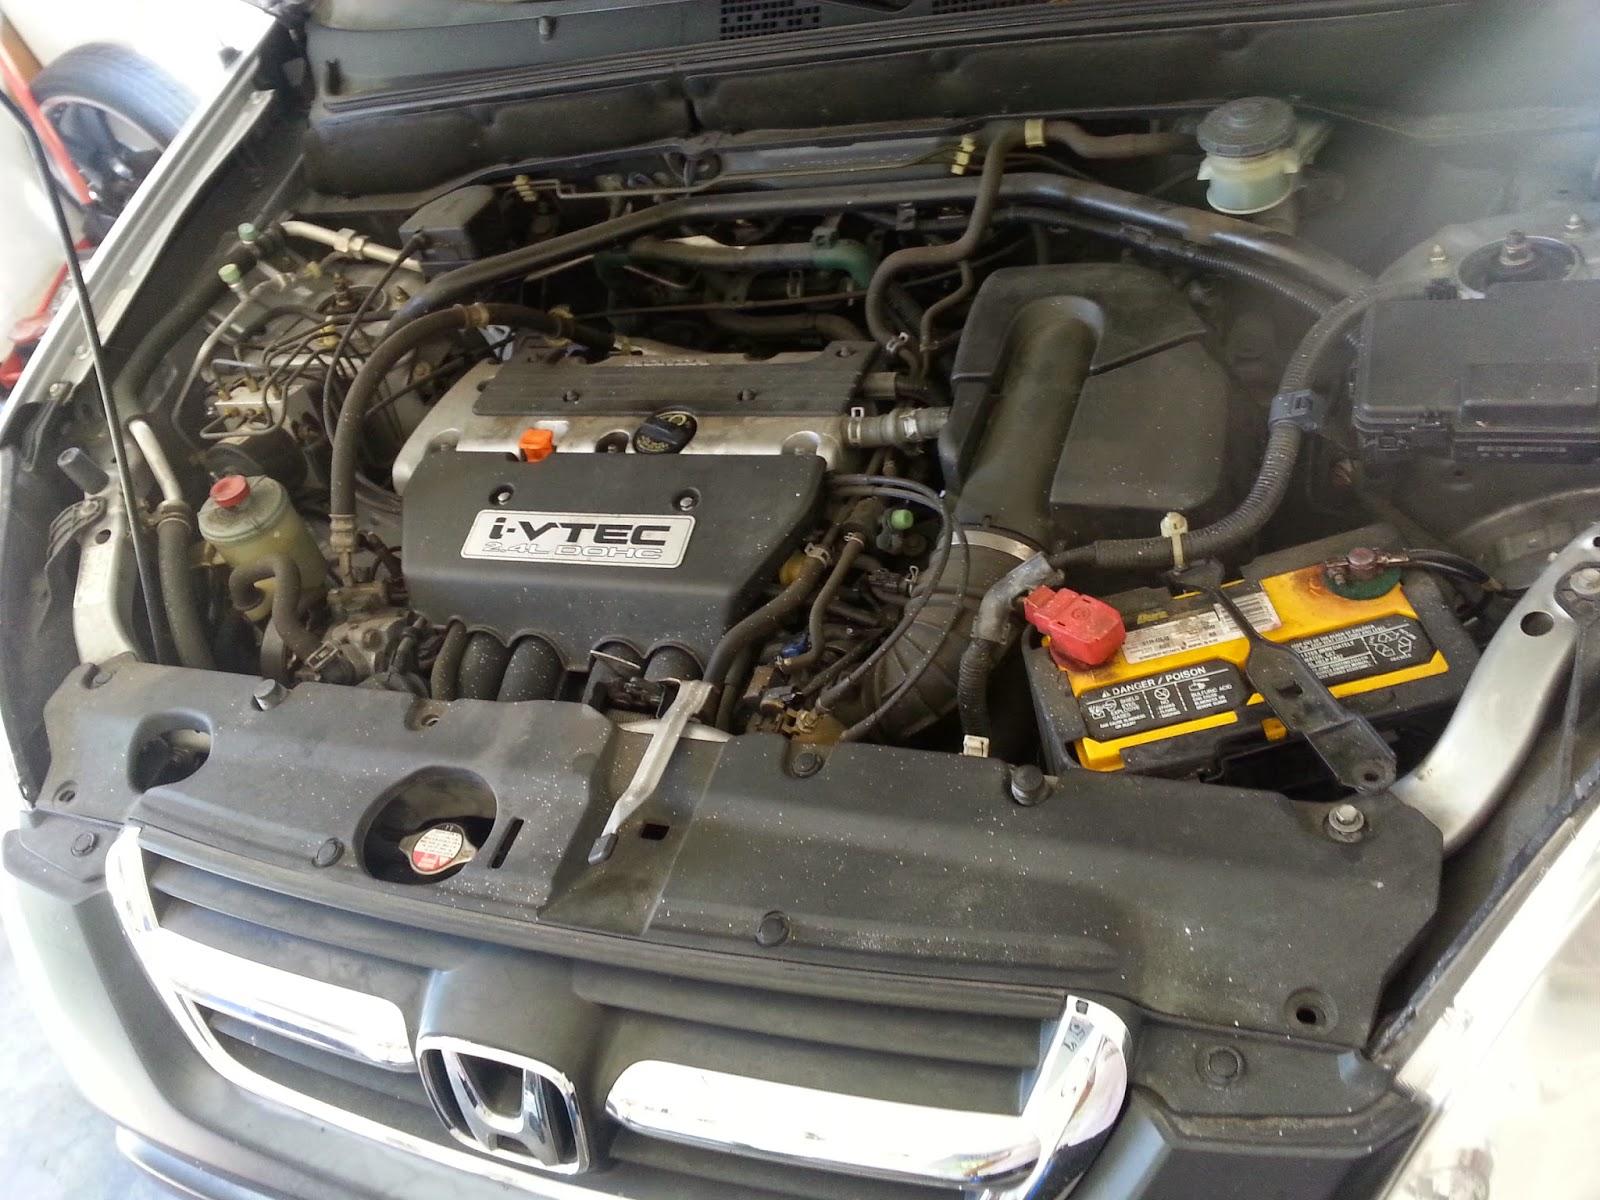 DIY 2000 Honda CRV Replacing A/C Condenser Fan